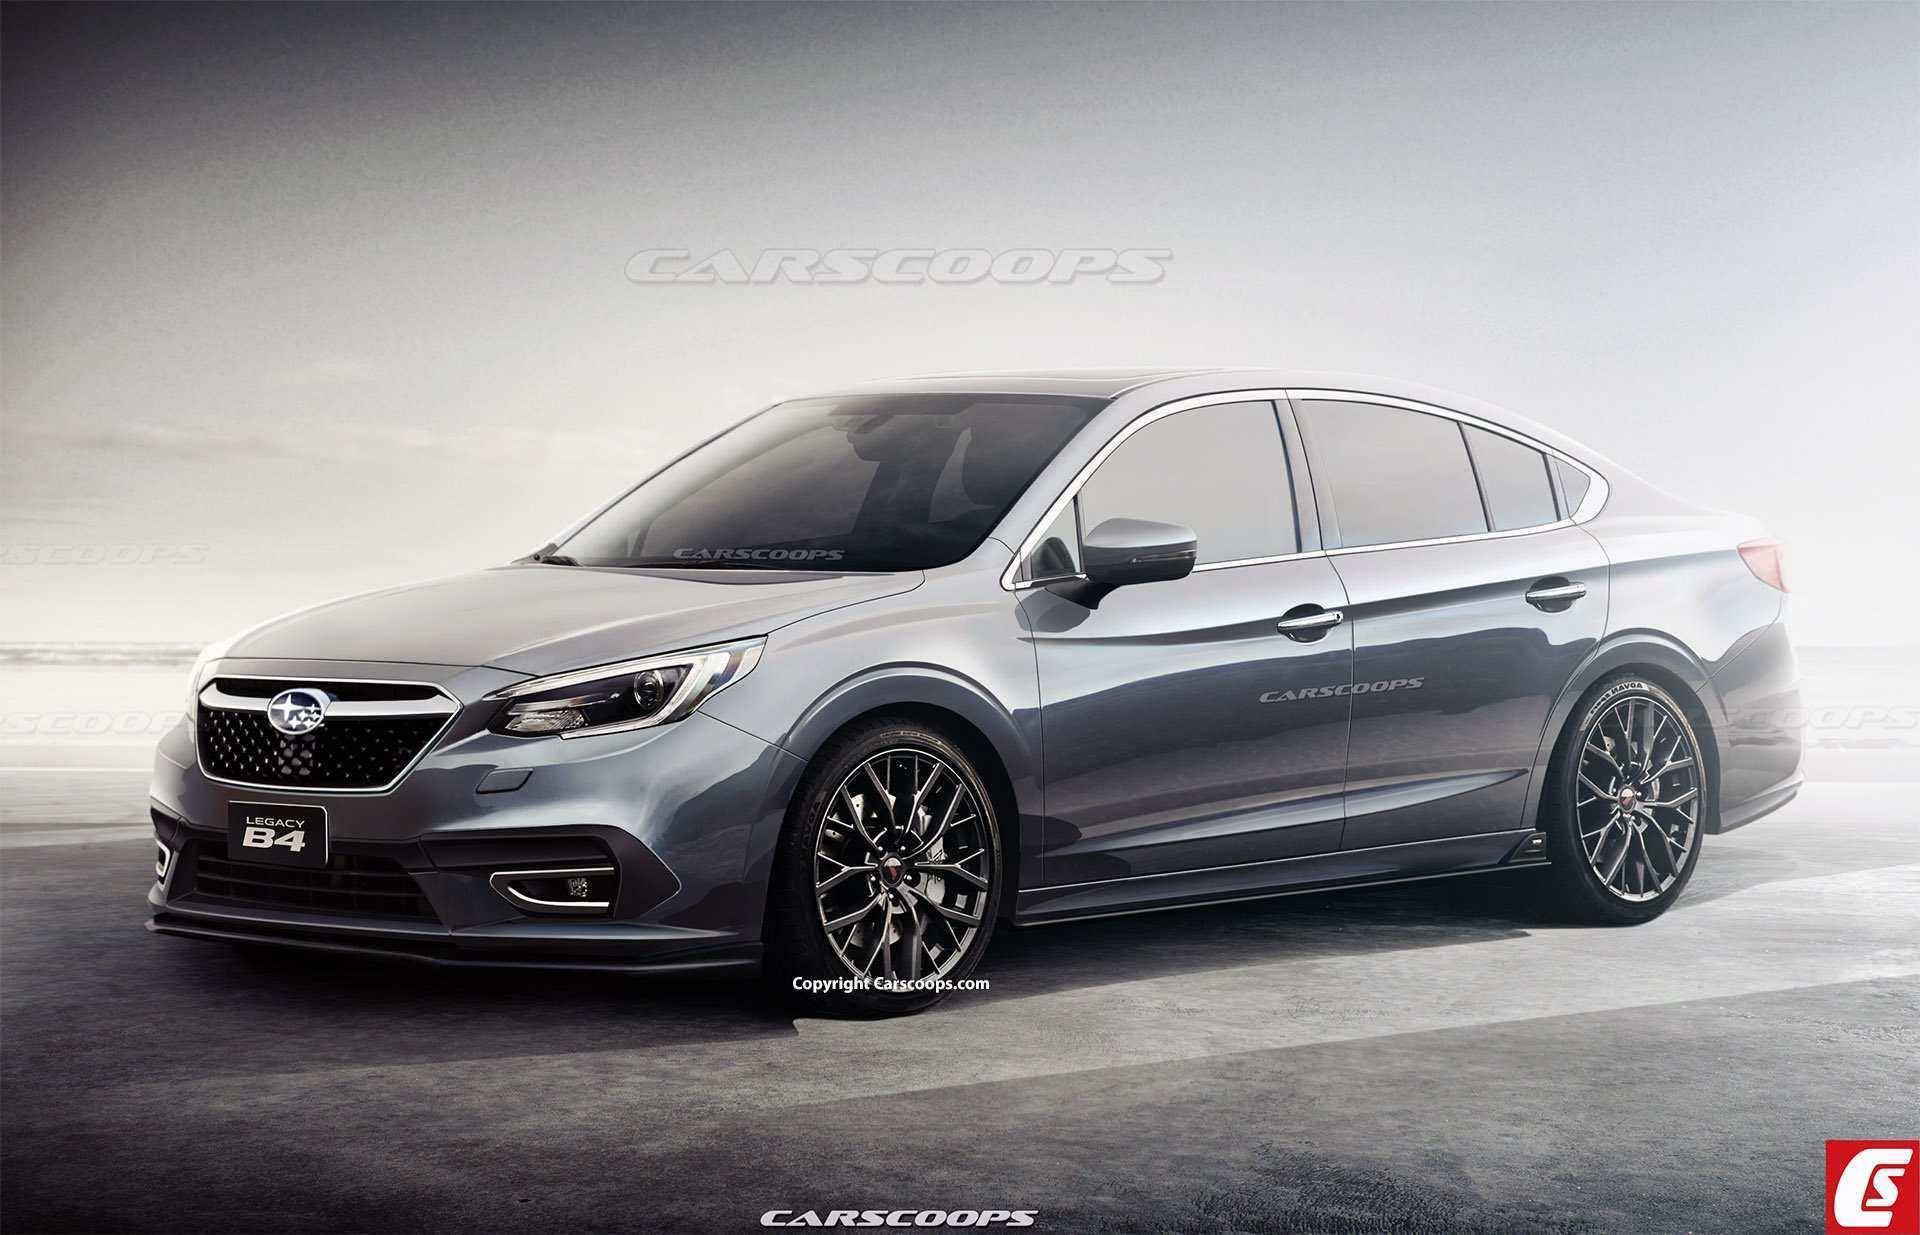 47 New Subaru Lineup 2020 Concept for Subaru Lineup 2020